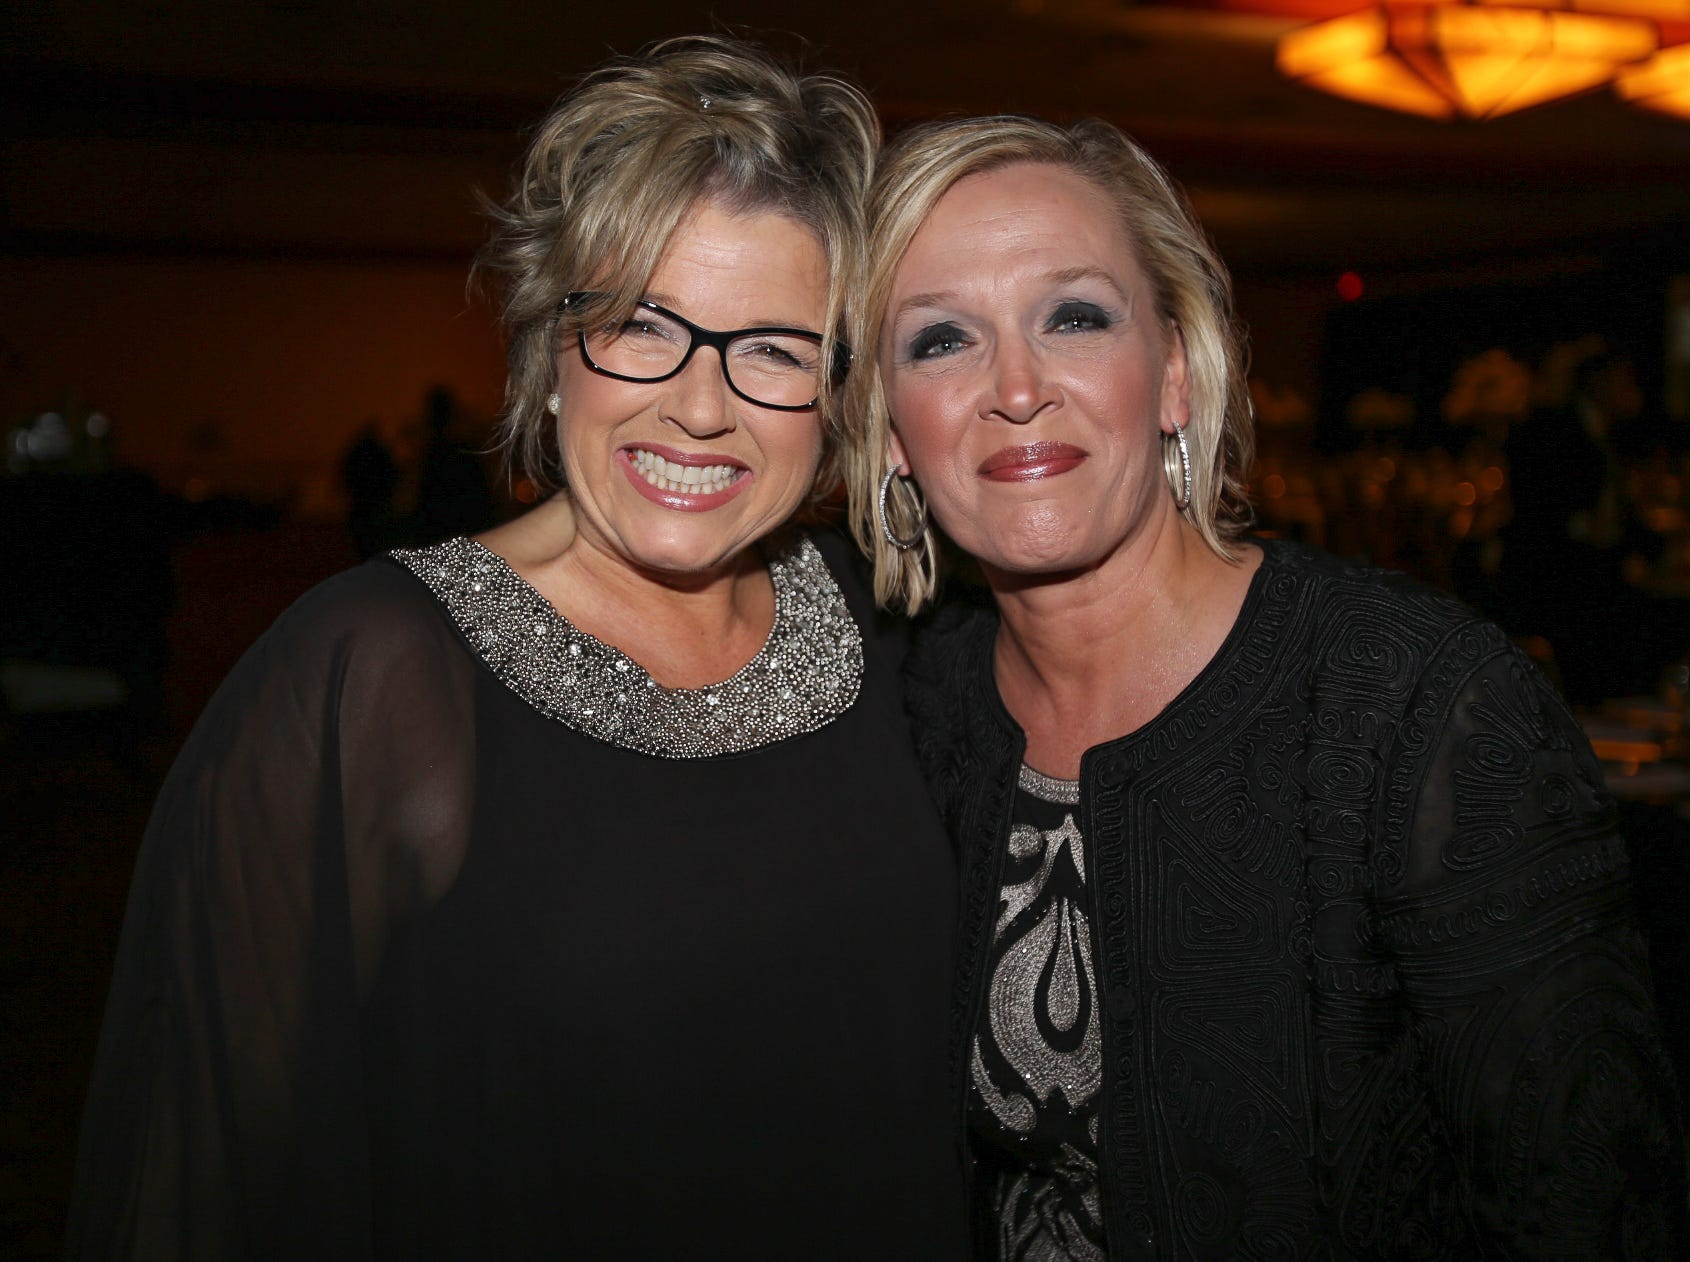 Lisa Lewellen and Cheryl Huson